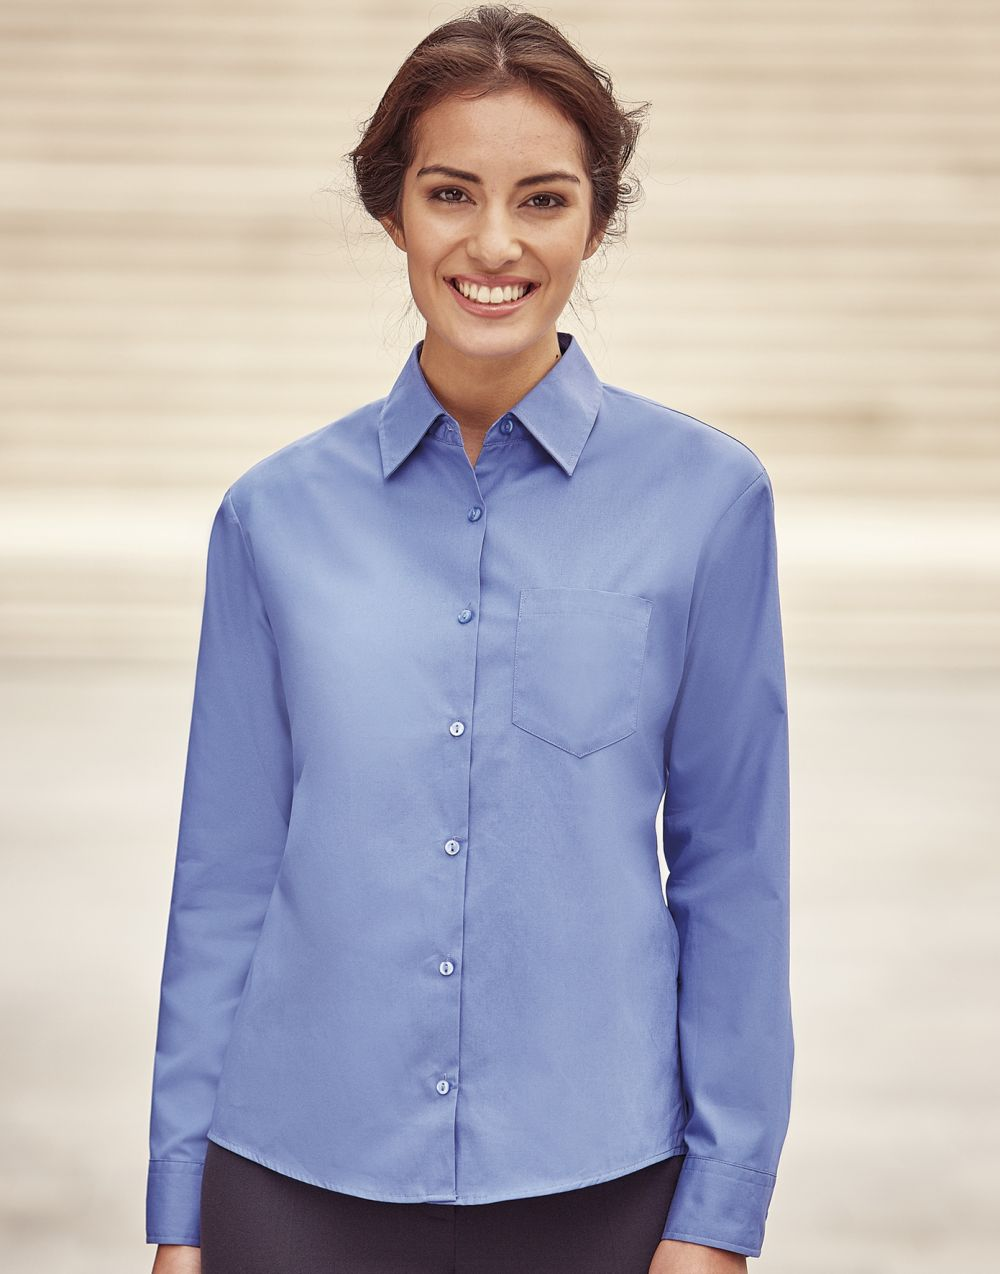 Camisas manga larga russell de mujer 100% algodón manga larga para personalizar vista 1